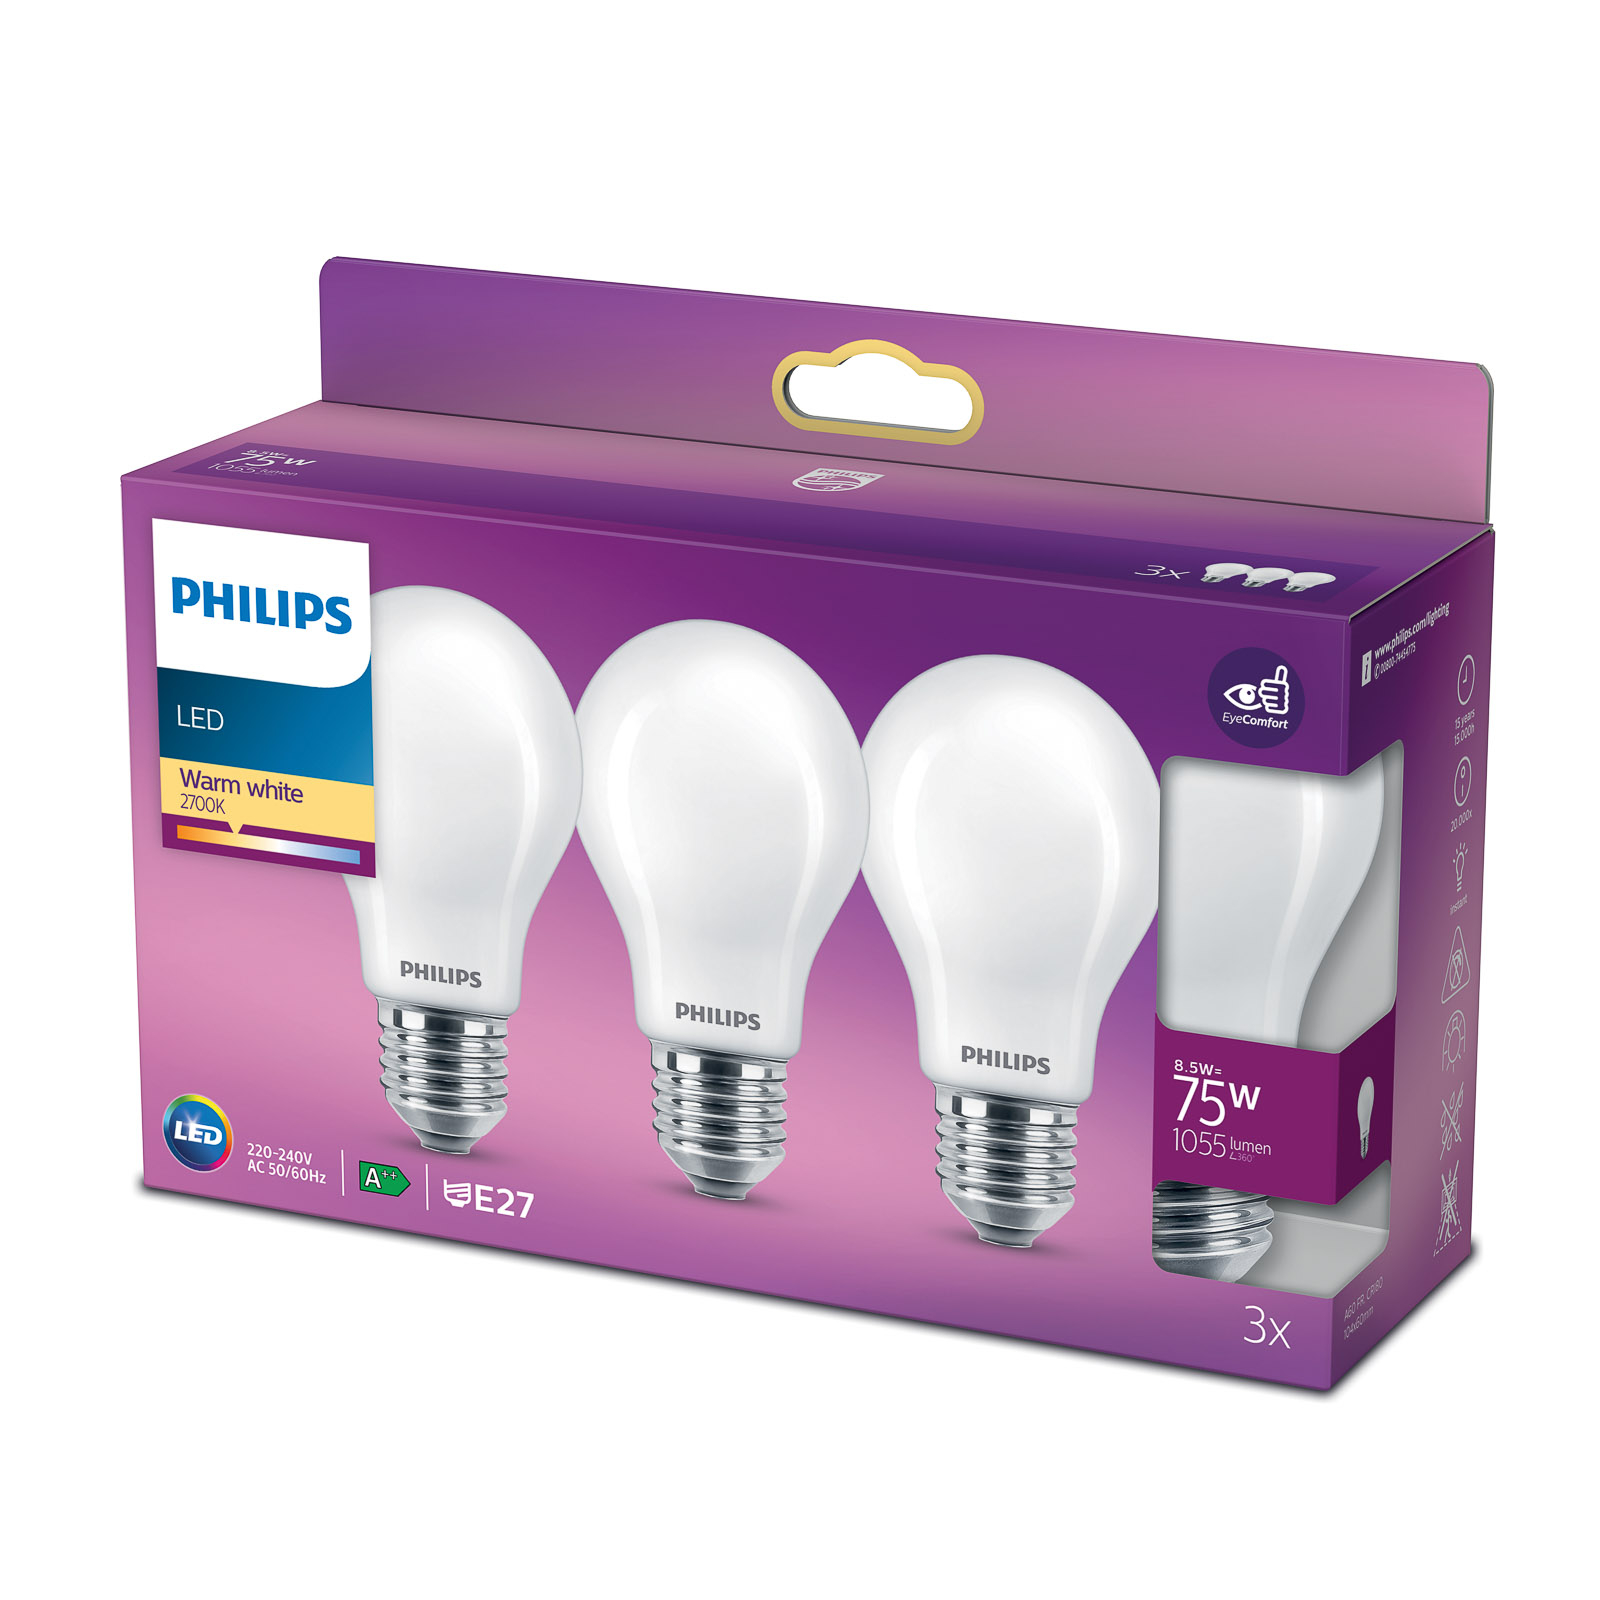 Philips 3 ampoules LED Classic E27 A60 8,5W 2700K